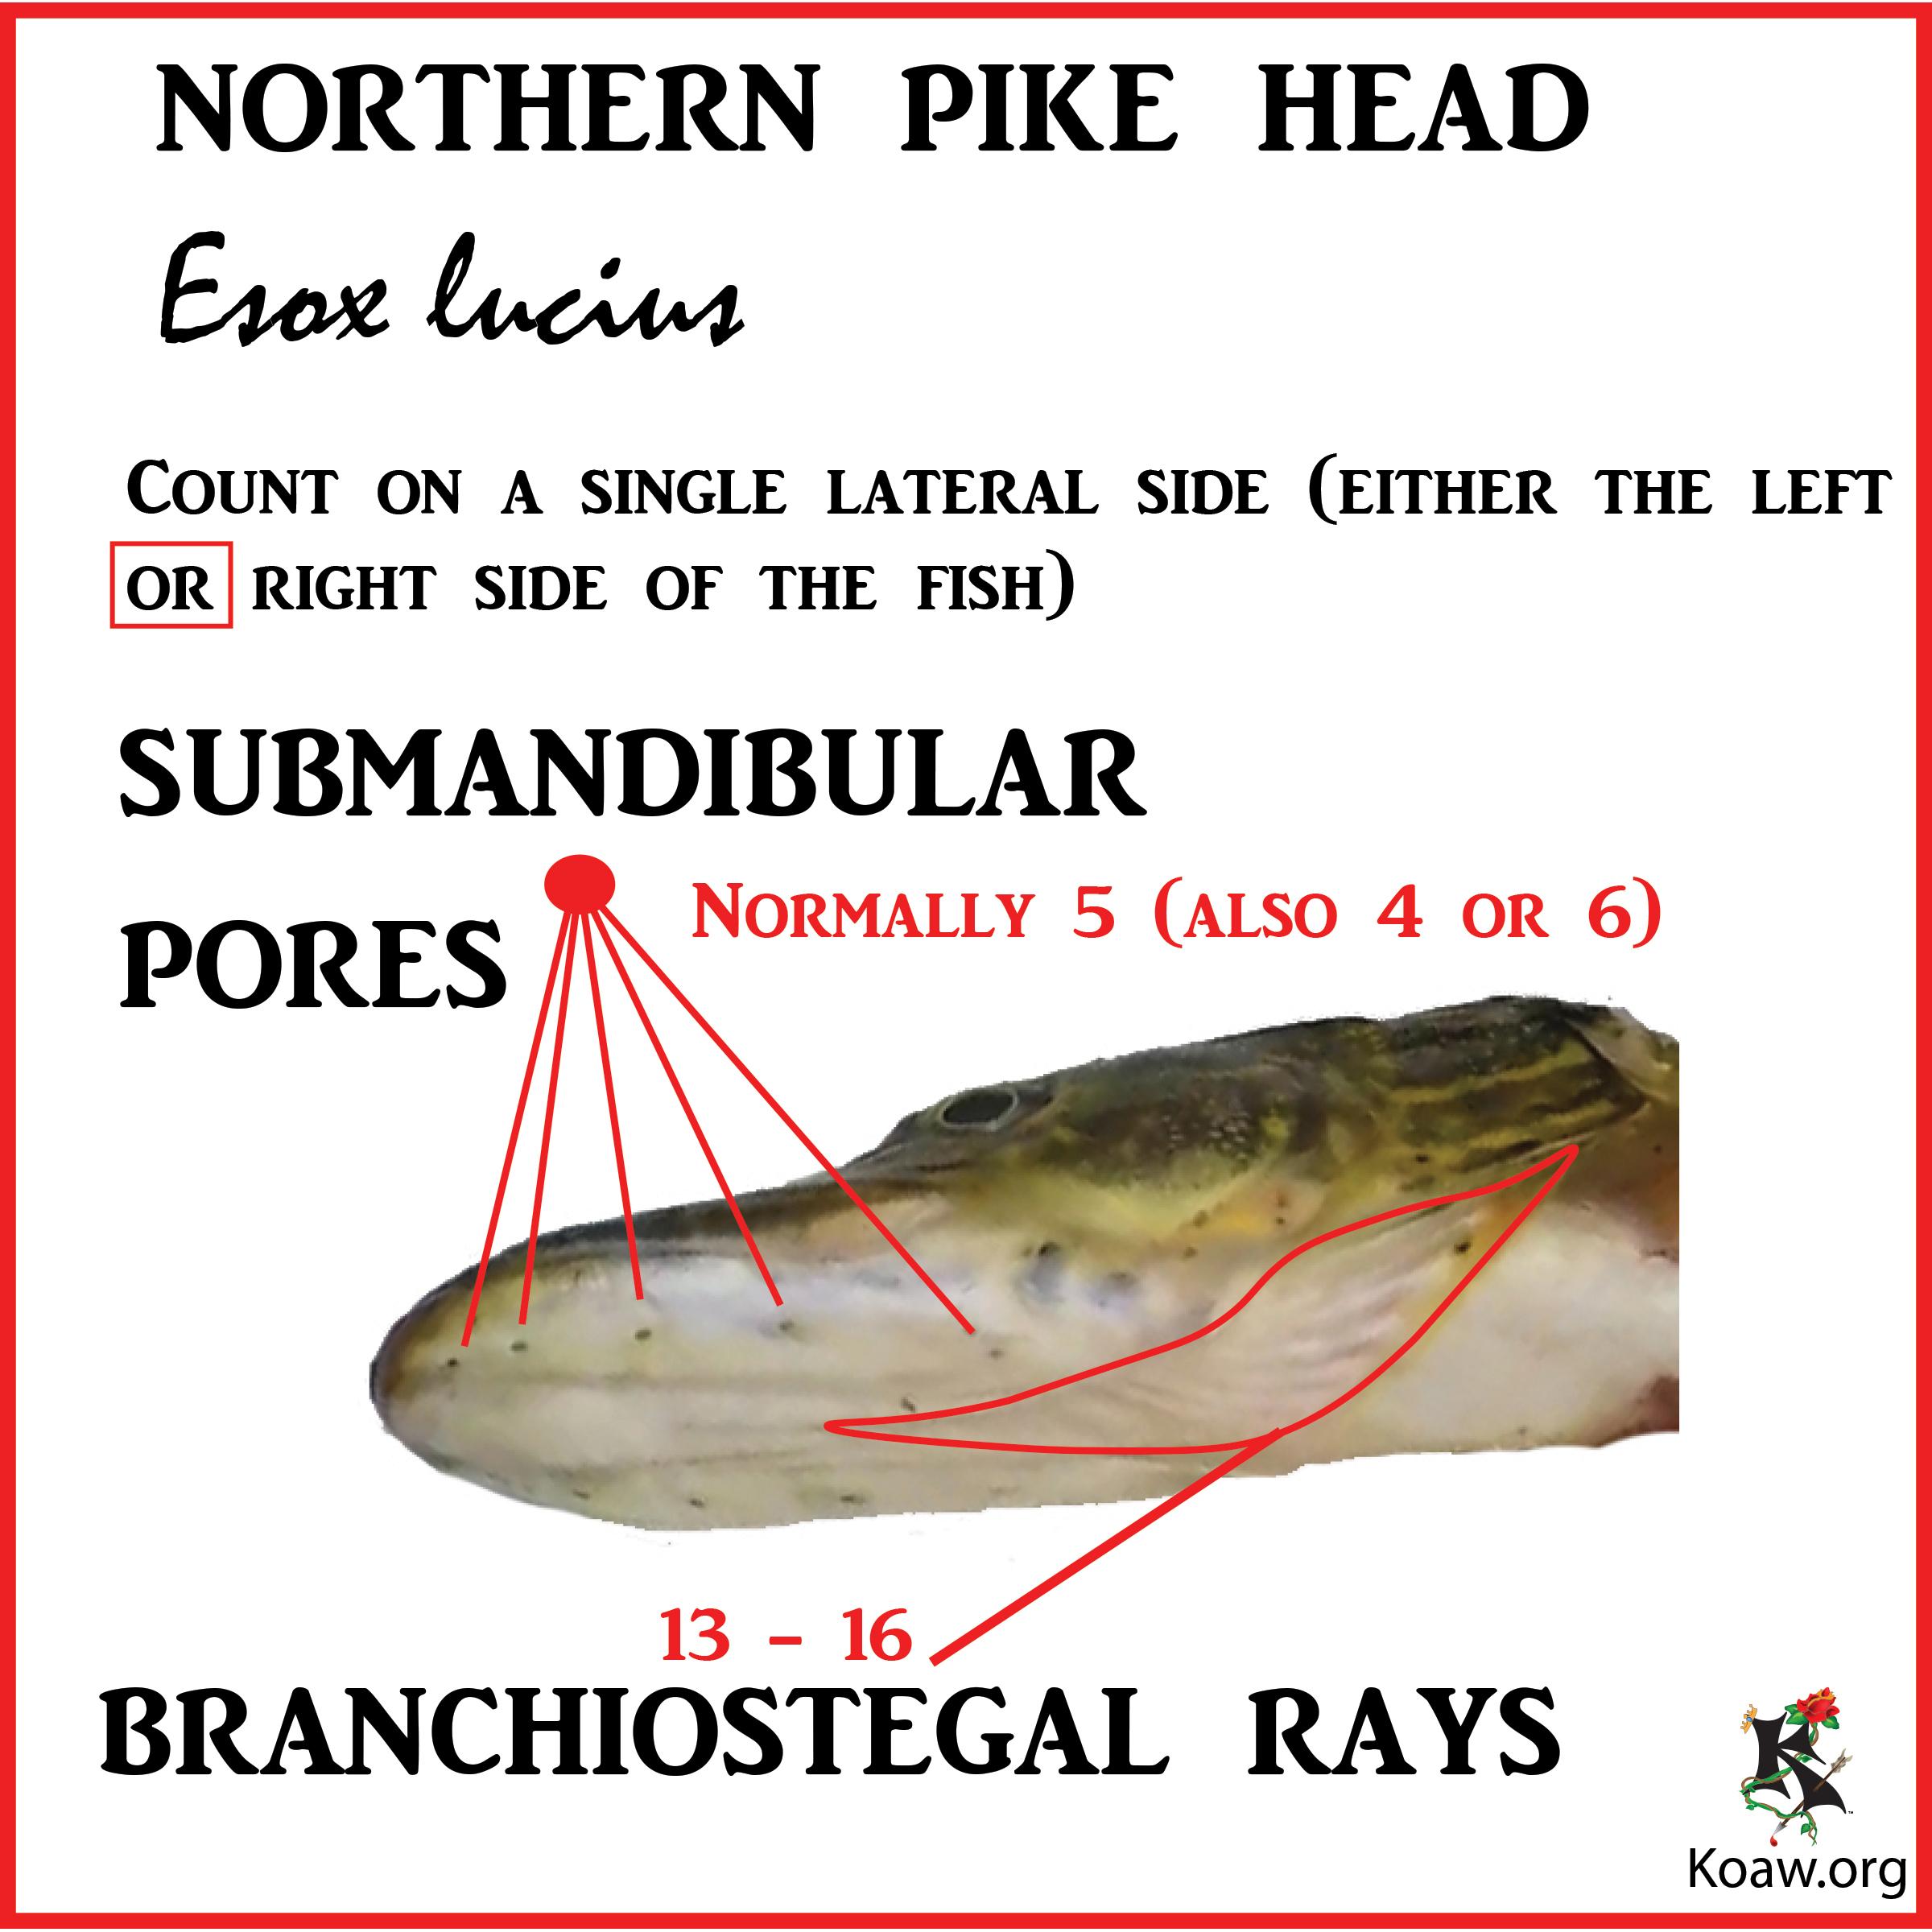 Submandibular Pores & Branchiostegal Rays N. Pike - Illustration by Koaw